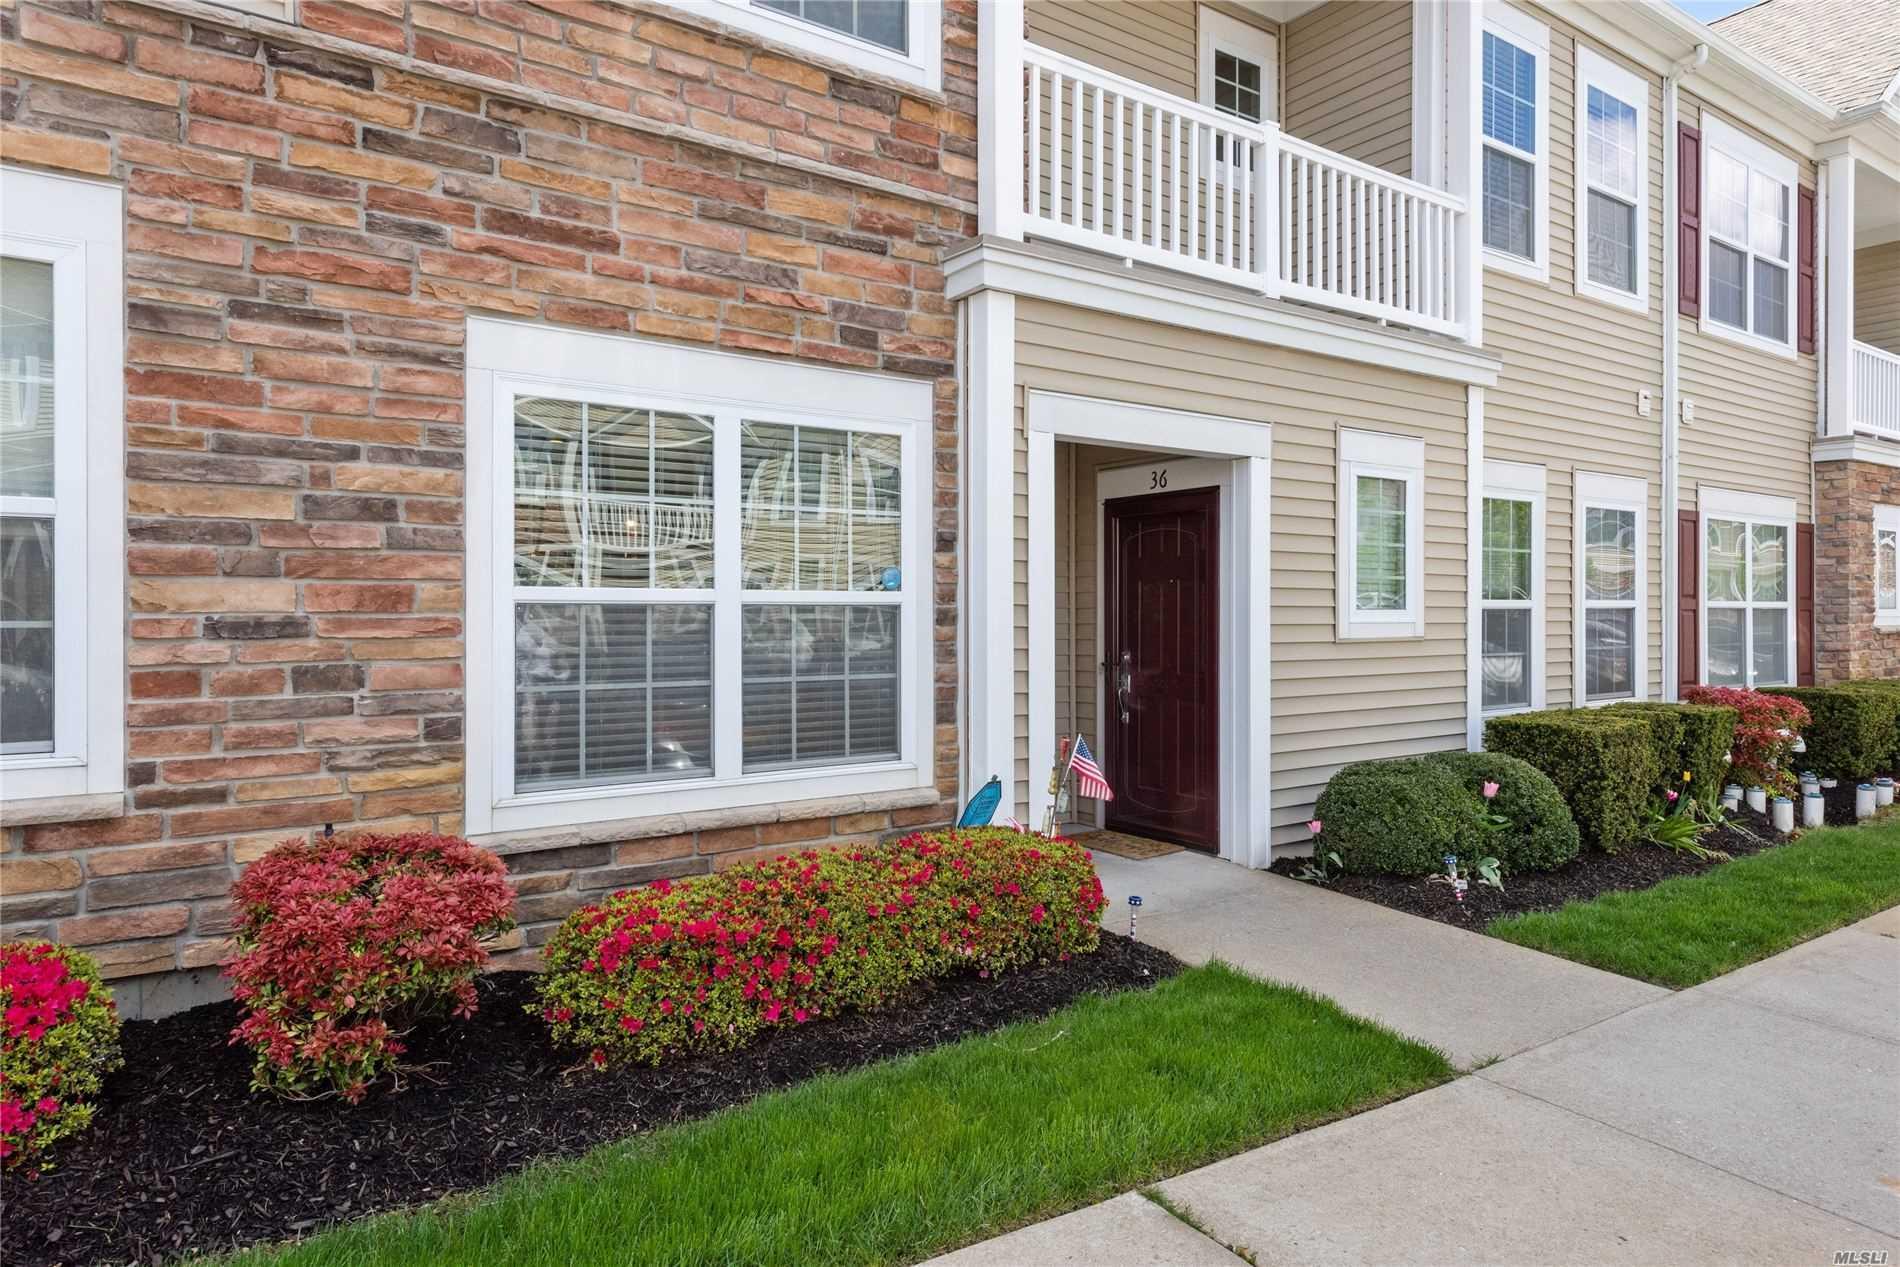 Property for sale at 35 Southampton Drive, Massapequa NY 11758, Massapequa,  New York 11758